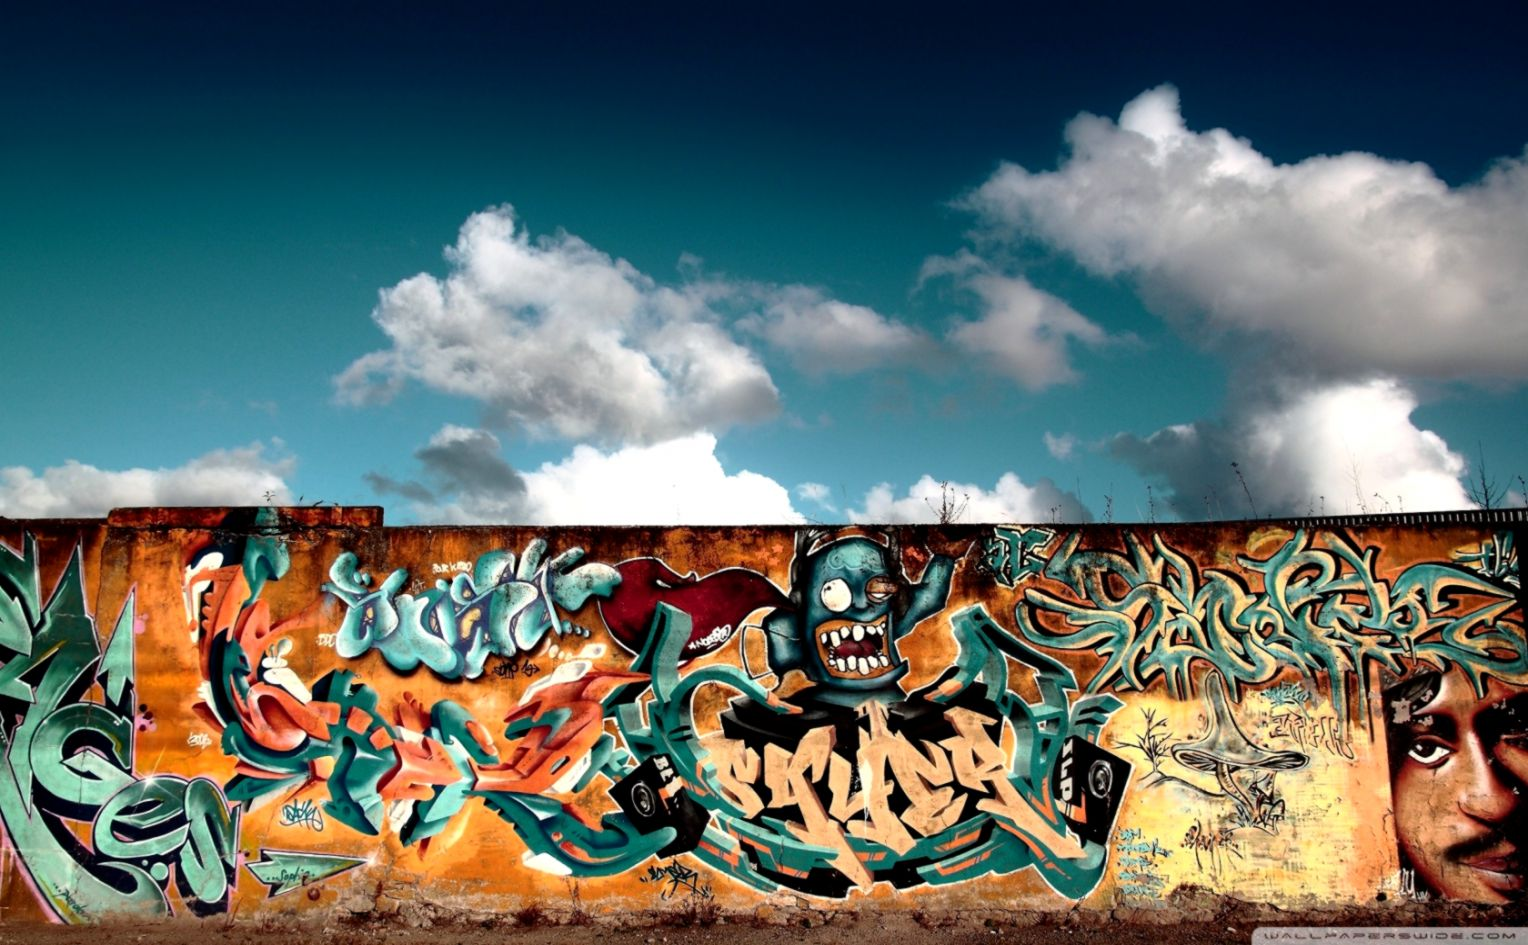 View Original Size Cool Art Wallpaper Graffiti Wall All